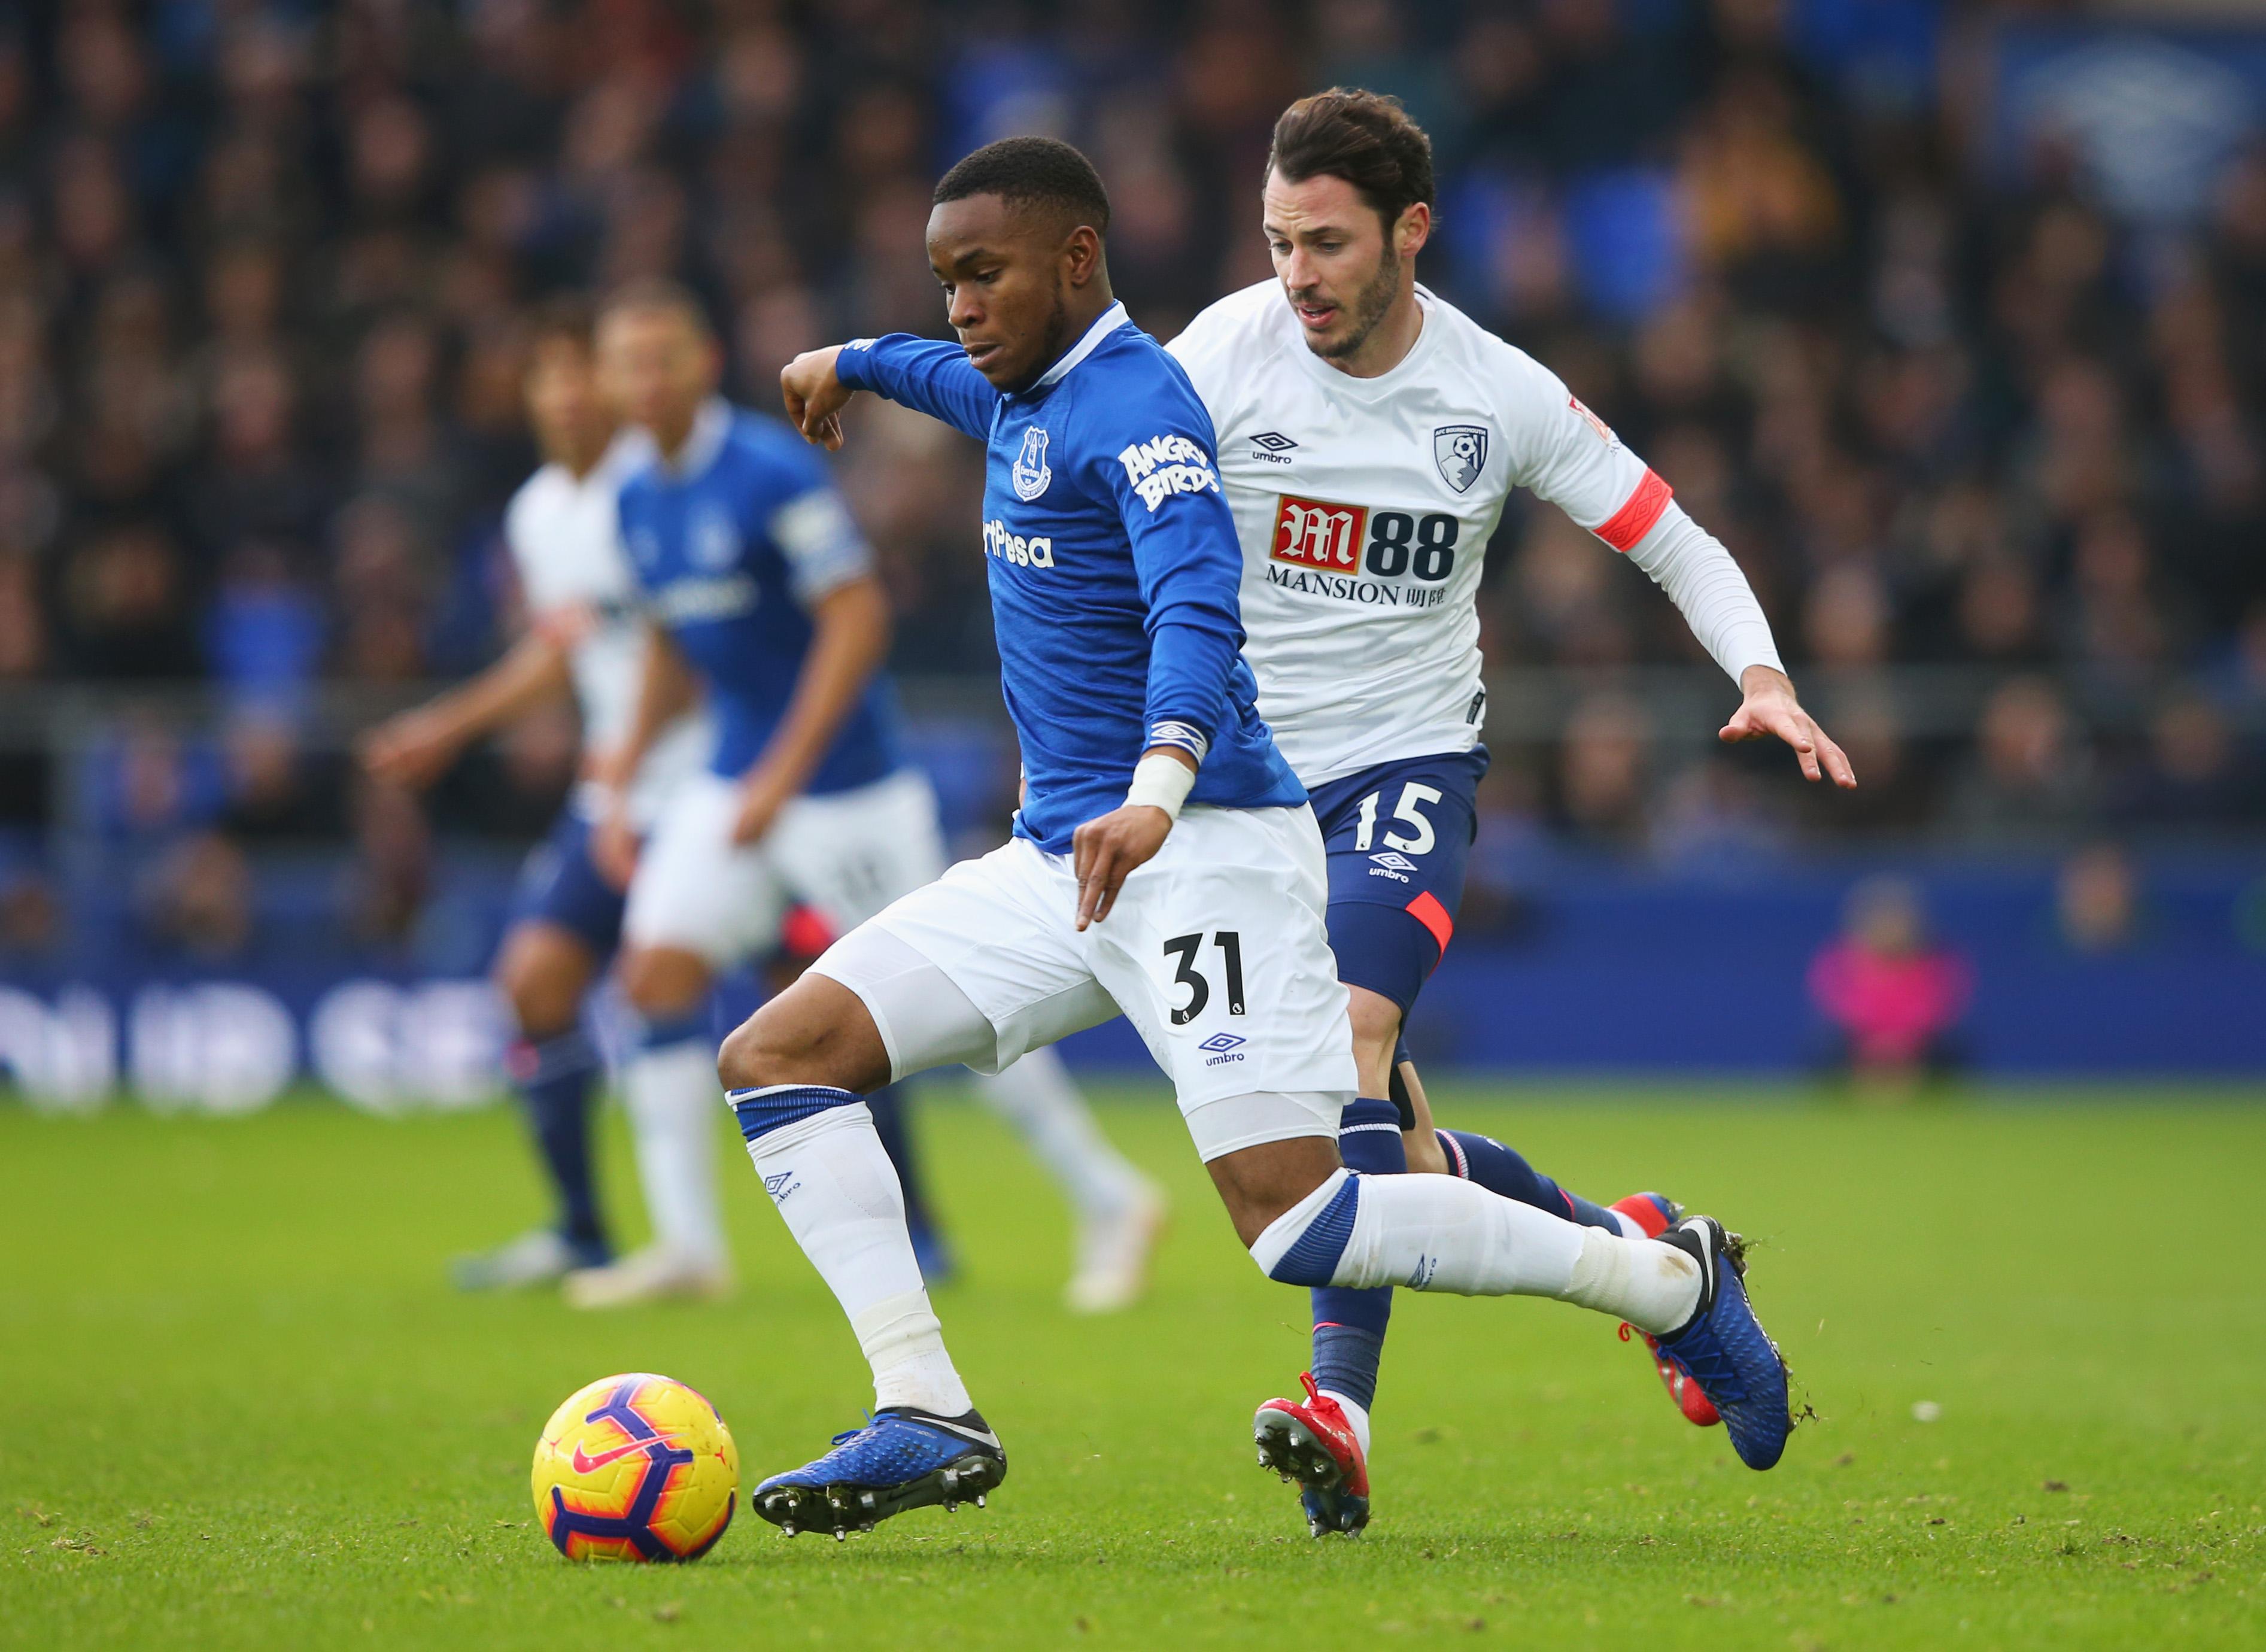 2018-19 Everton Report Cards: Ademola Lookman